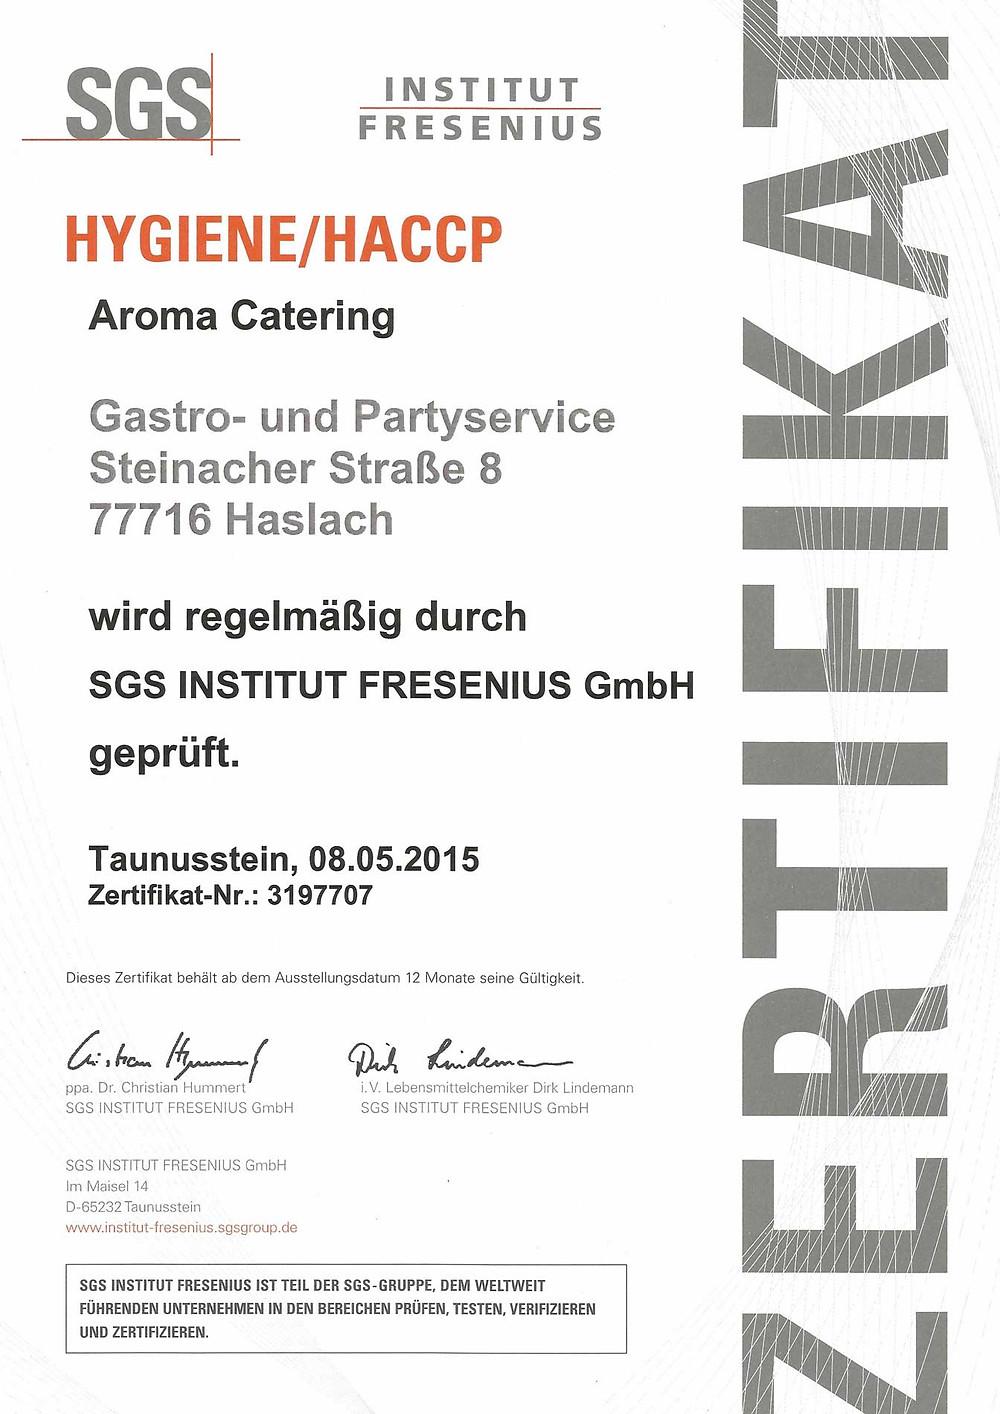 Zertifikat-2015-HACCP-Hygiene.jpg